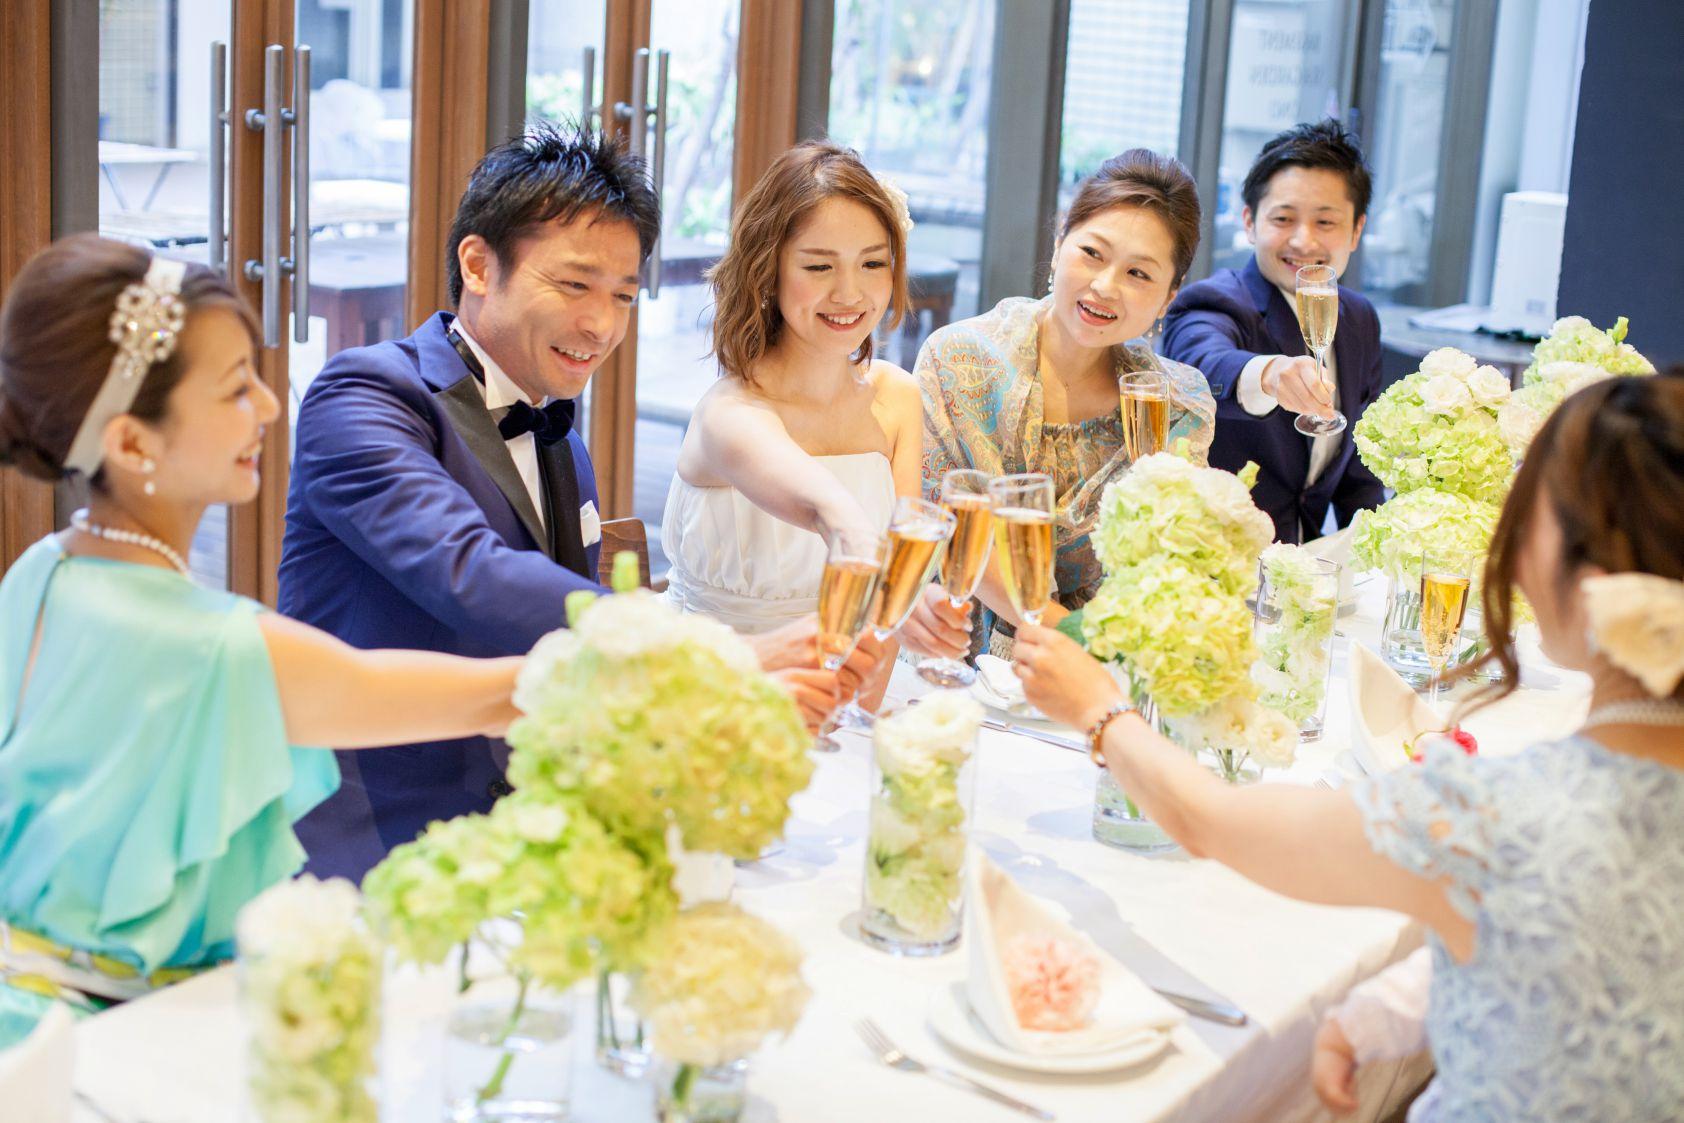 BASEMENT SEA GARDEN ONO|1.5次会・会費制・少人数お食事会・パーティなどのオススメ会場|福岡・九州で和装の神社結婚式・和婚ならウェディングセレクト!和婚